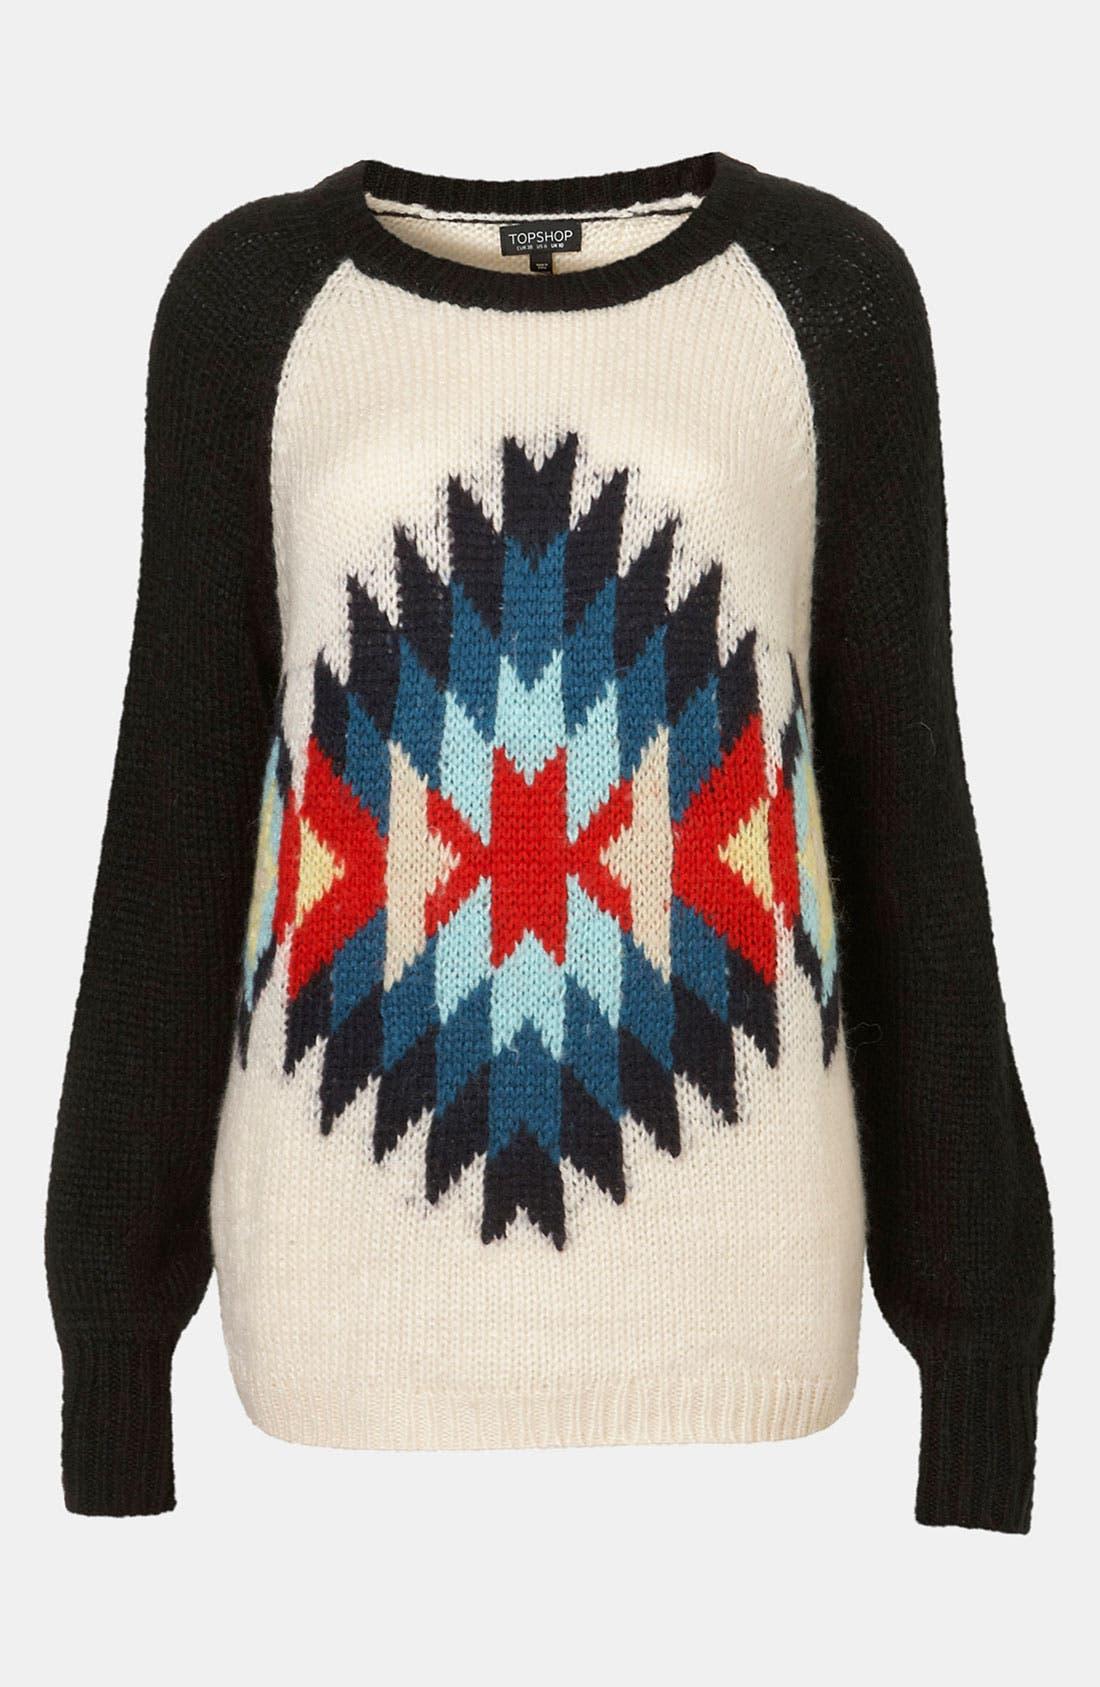 TOPSHOP, 'Eye Dazzler' Sweater, Main thumbnail 1, color, 901